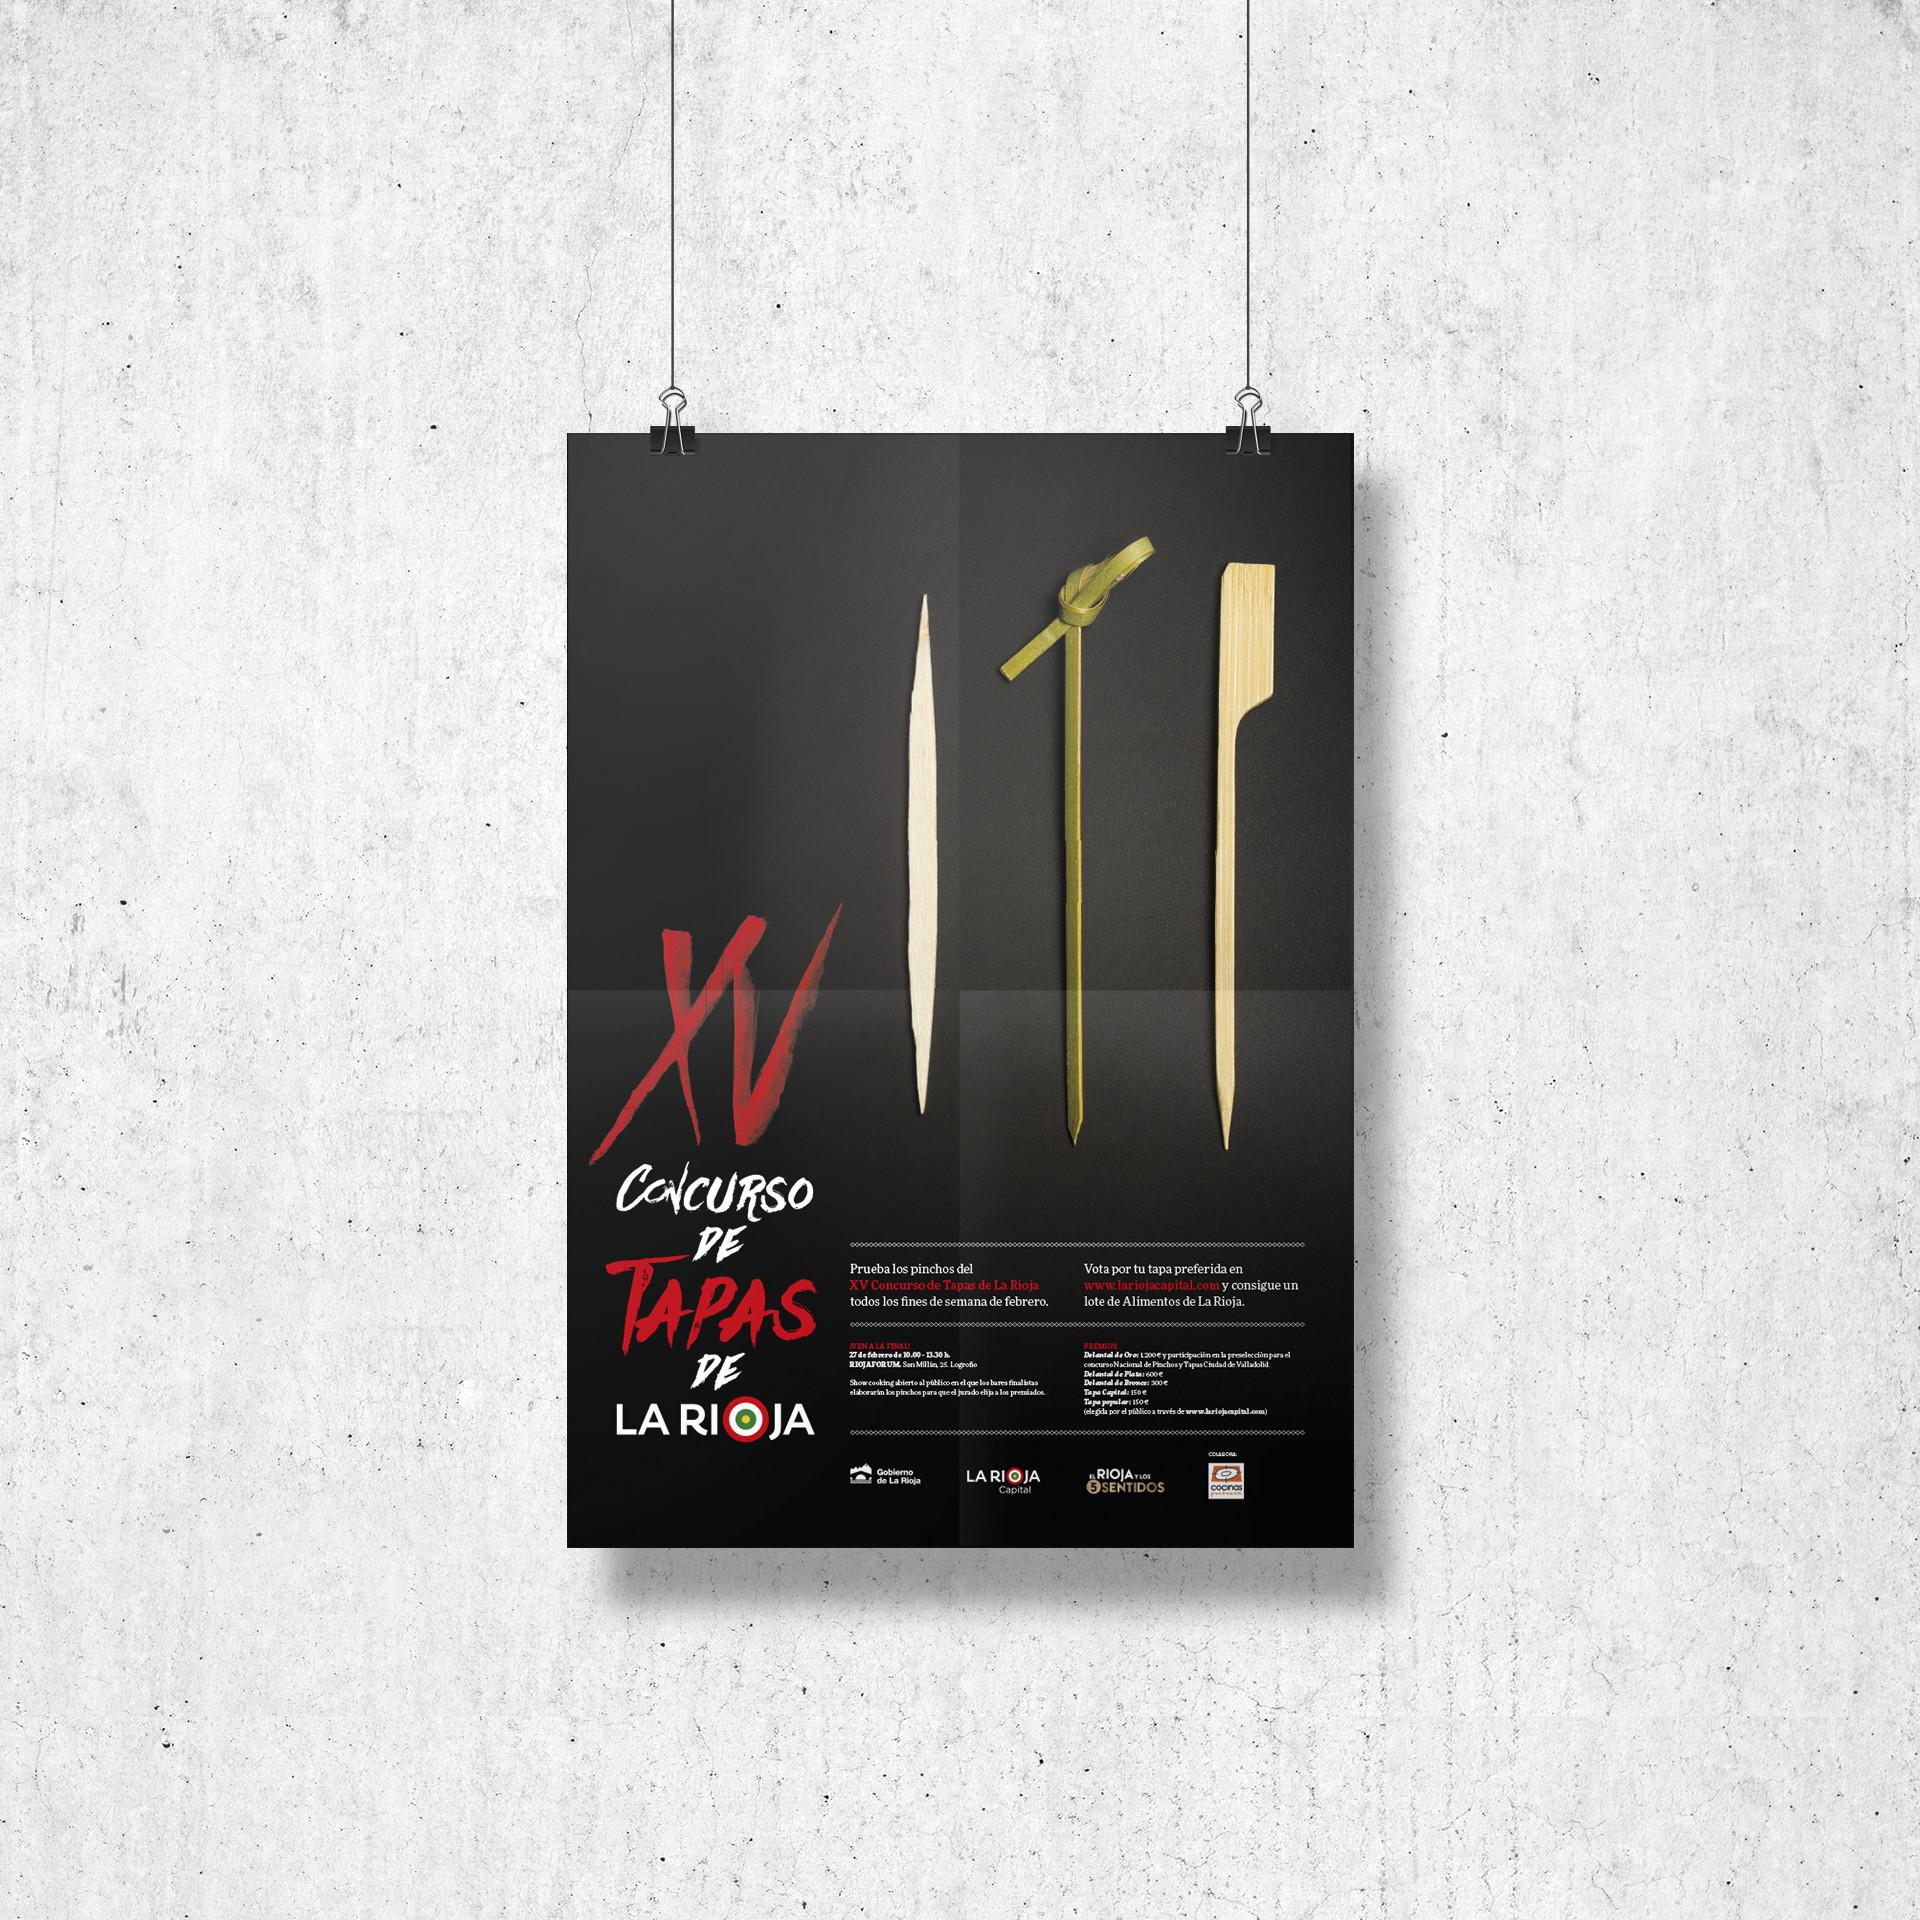 Cartel campaña XV concurso tapas La Rioja 2016